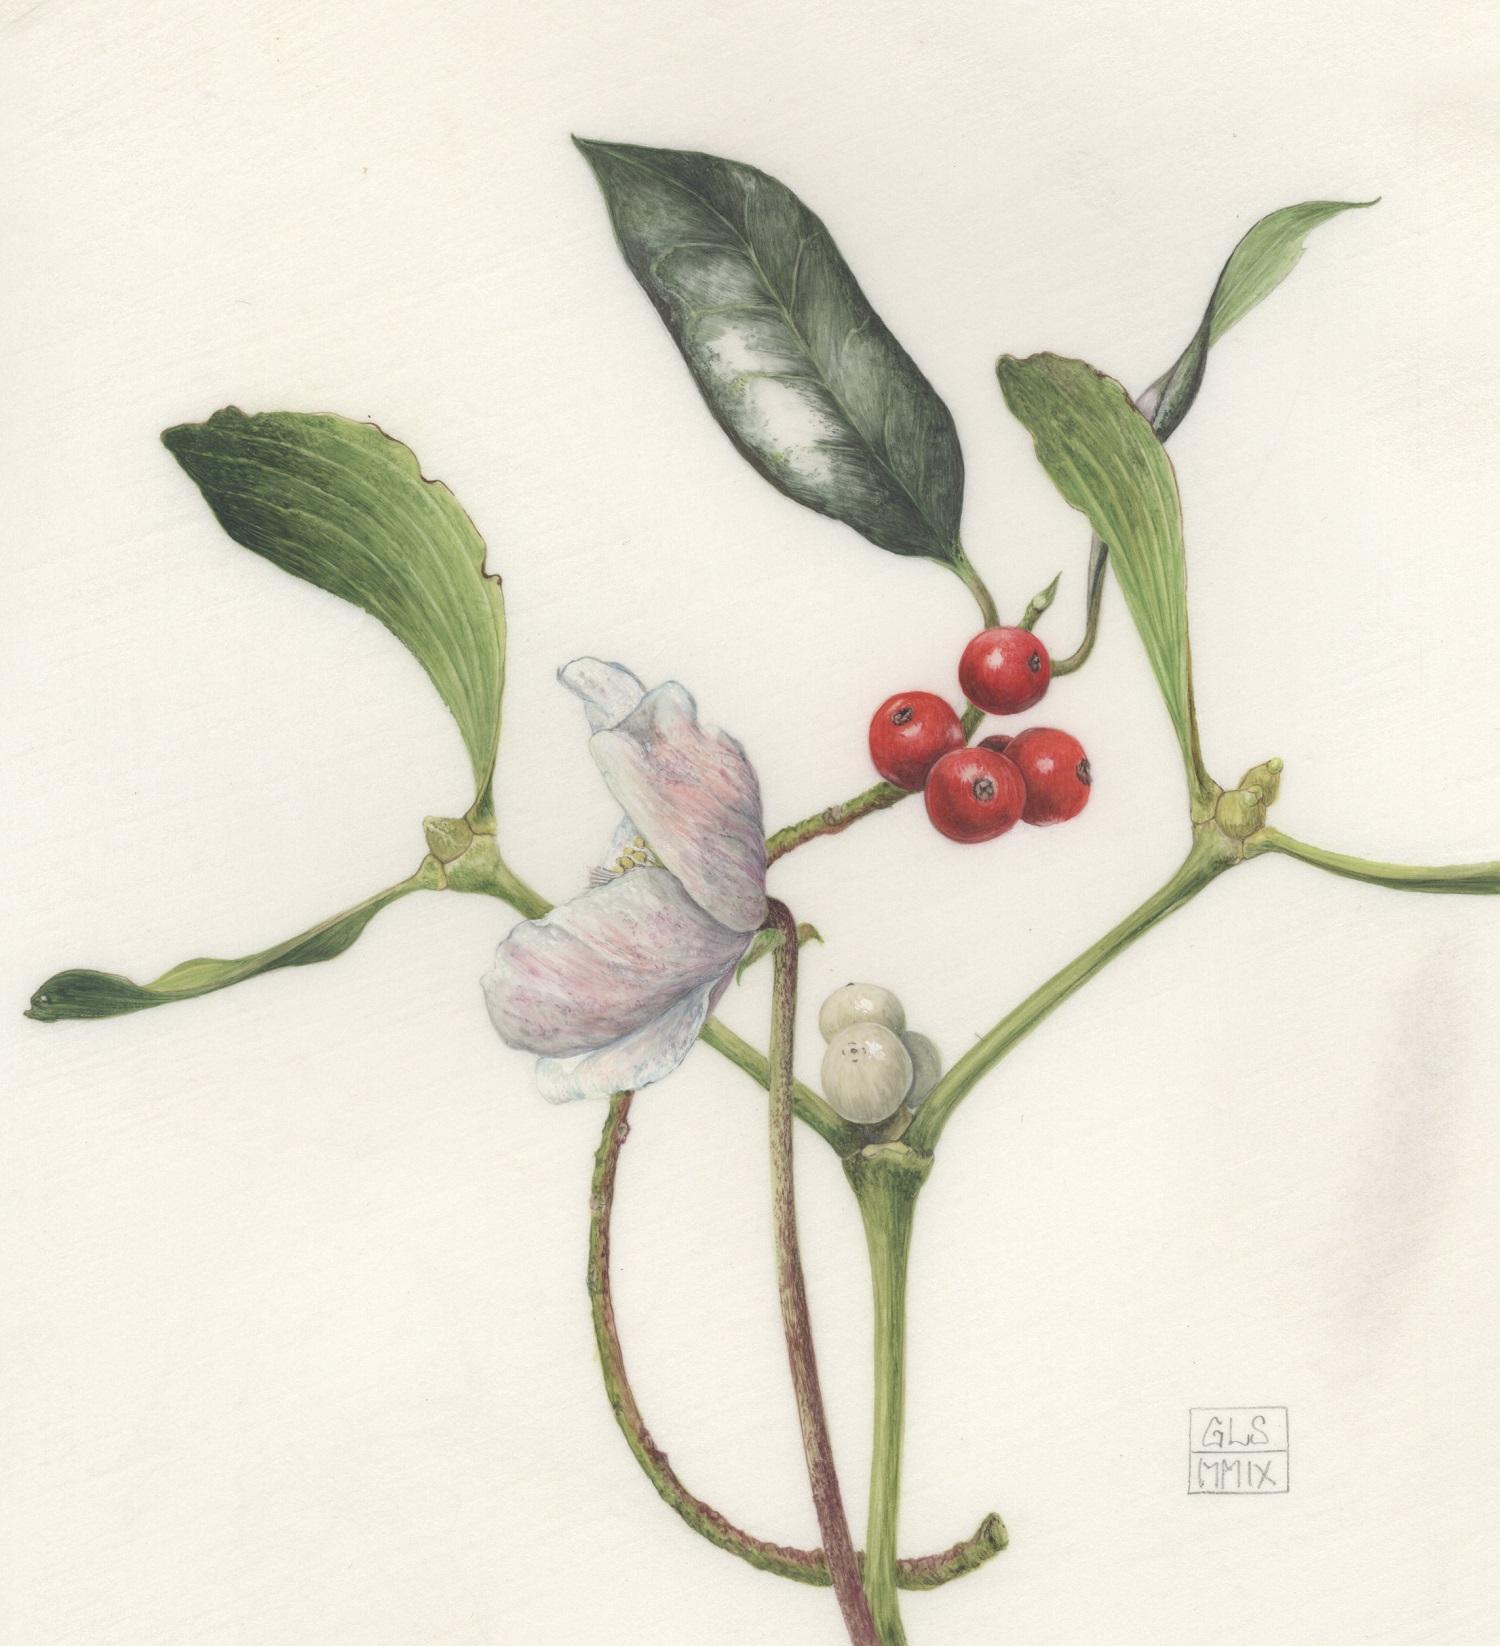 Christmas Rose, Mistletoe and Holly  watercolour on kelmscott vellum  14.5 x 15.5 cm  SOLD